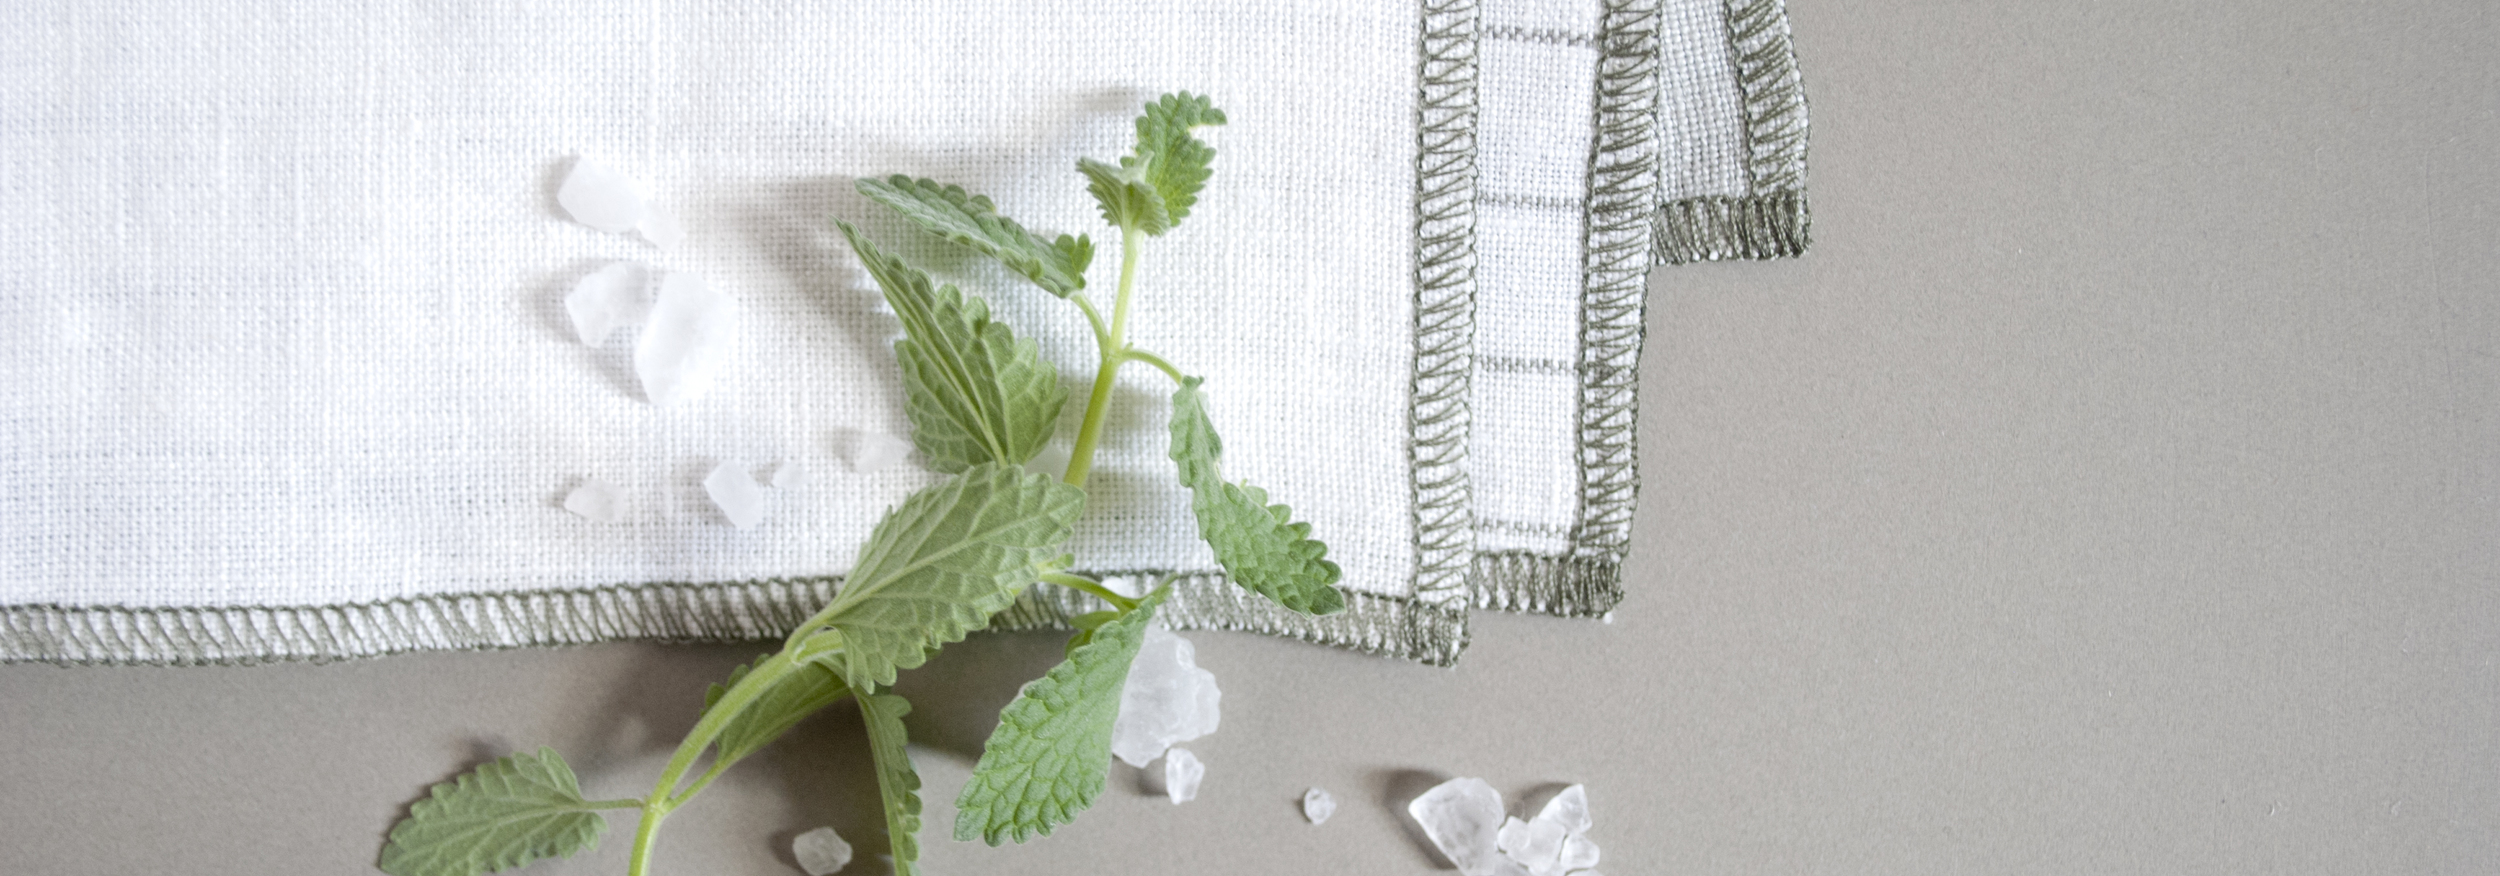 the-everyday-napkin-boston-cloth-reusable